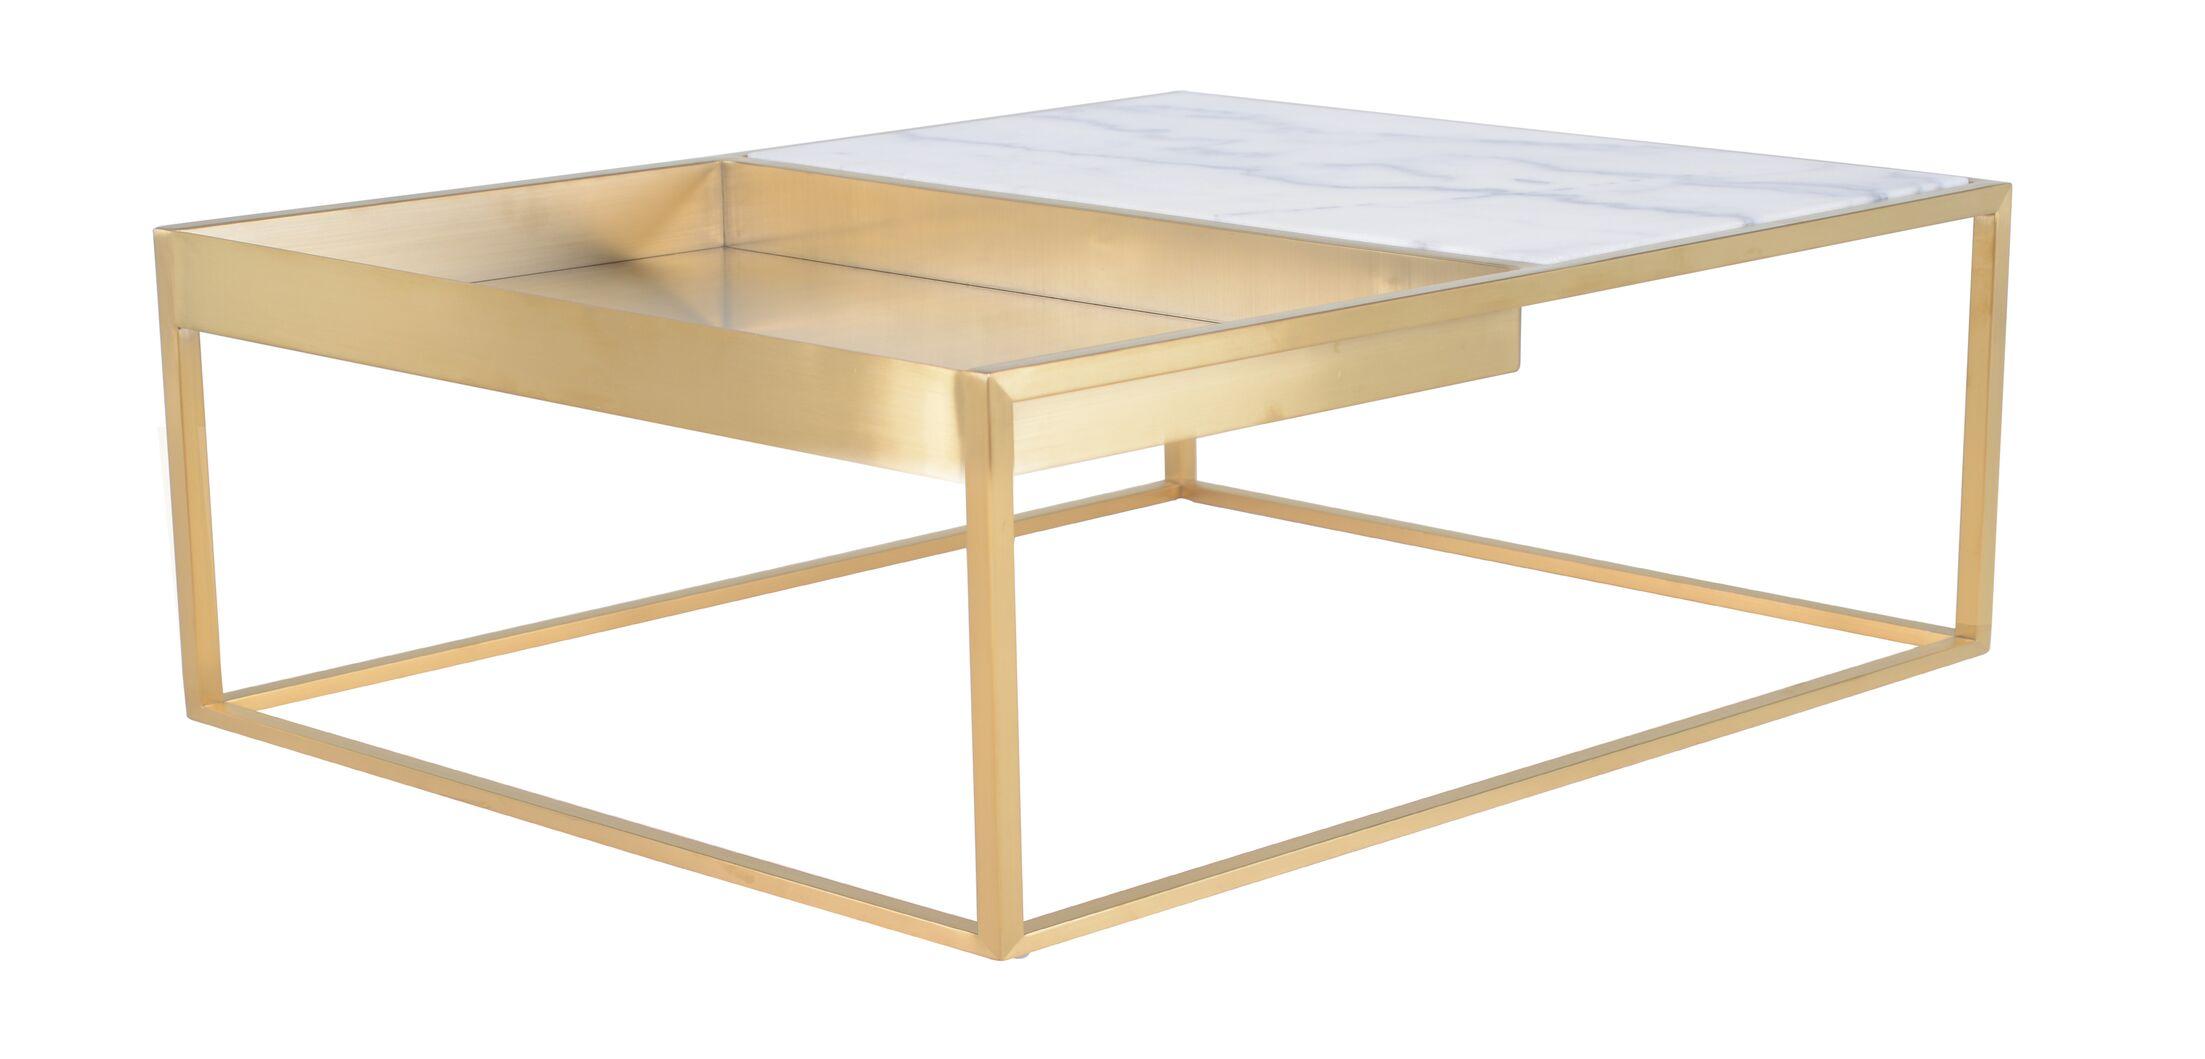 Fareham Coffee Table Color: White/Gold